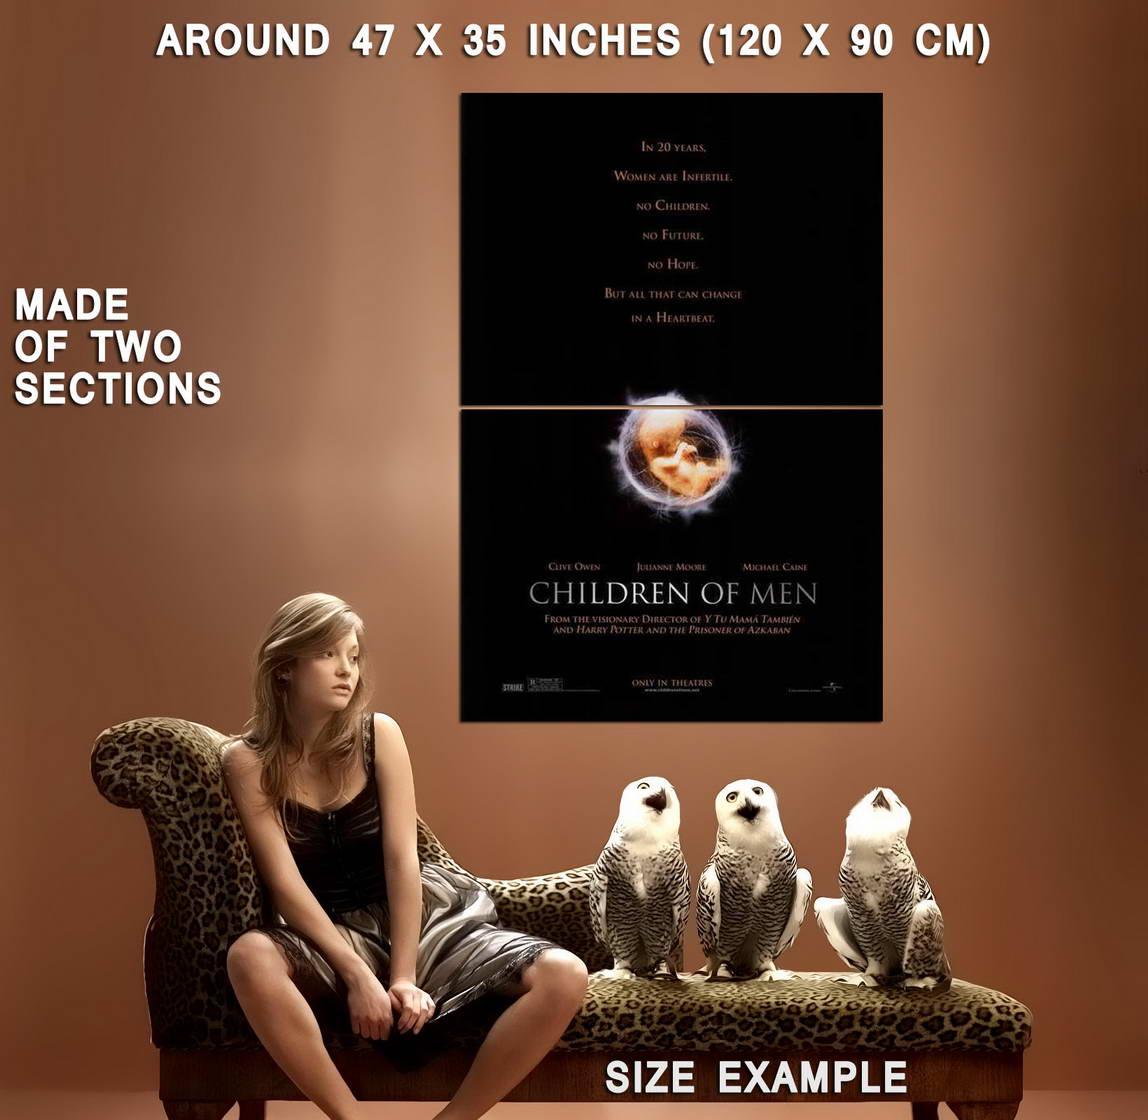 70155-Children-of-Men-Movie-Clive-Owen-Julianne-Moore-Wall-Print-Poster-Affiche